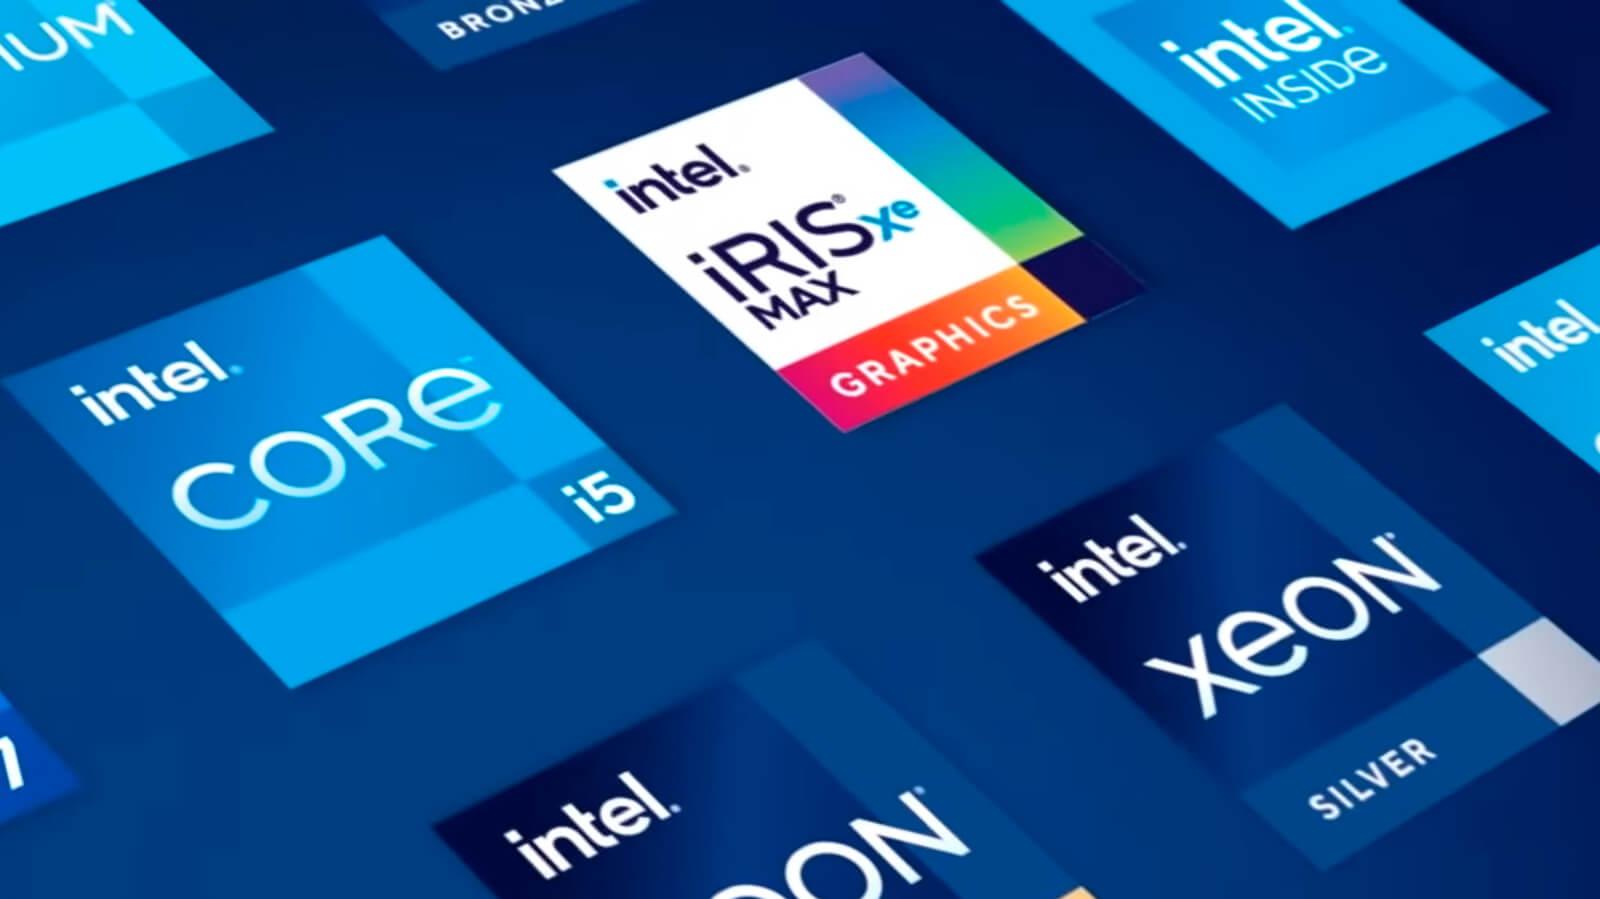 intel_iris_xe_max_graphics (1)